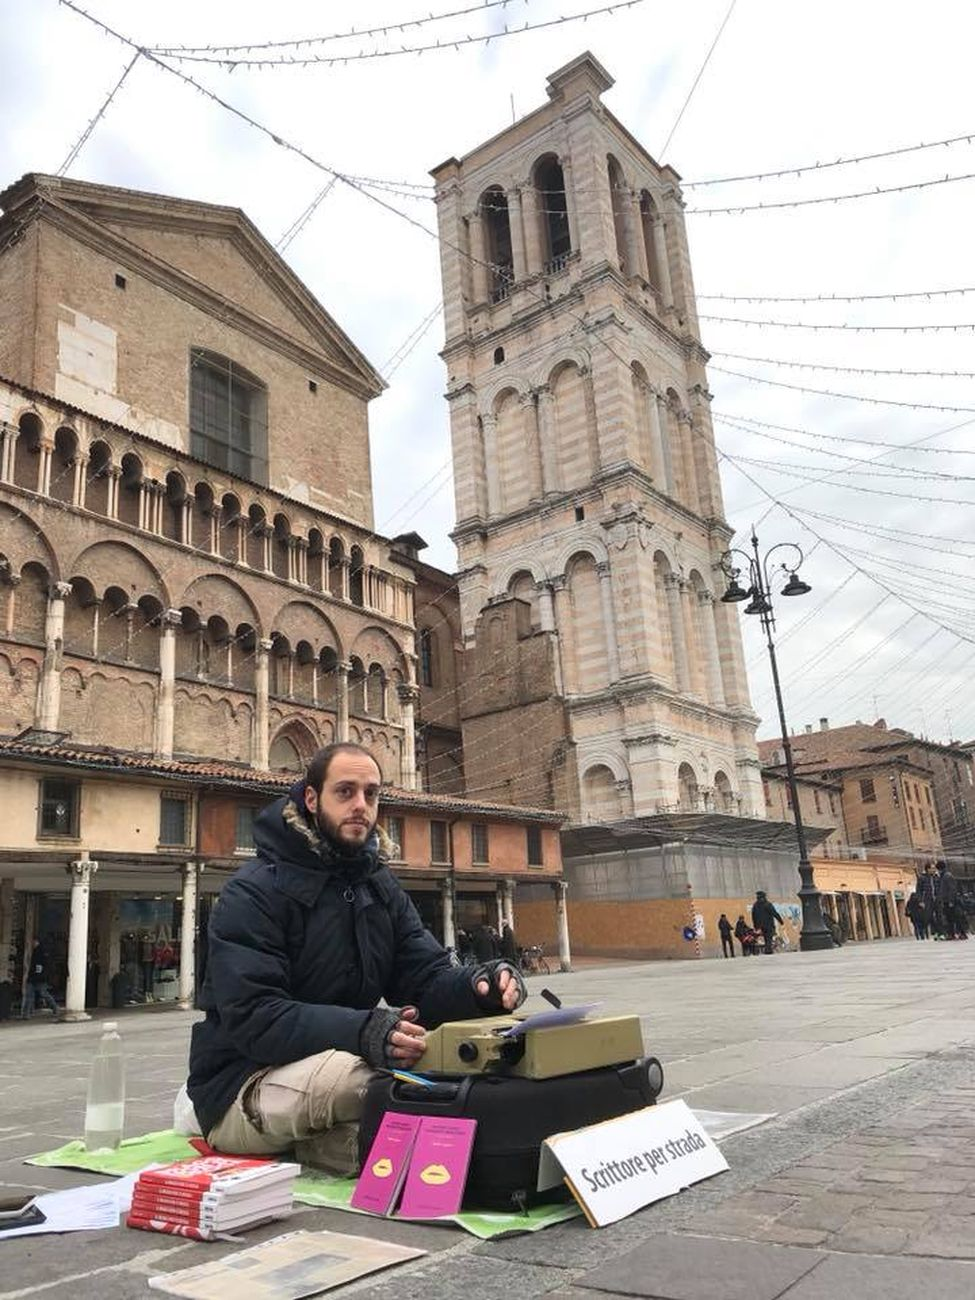 Walter Lazzarin, Ferrara, Piazza Trento e Trieste, gennaio 2018